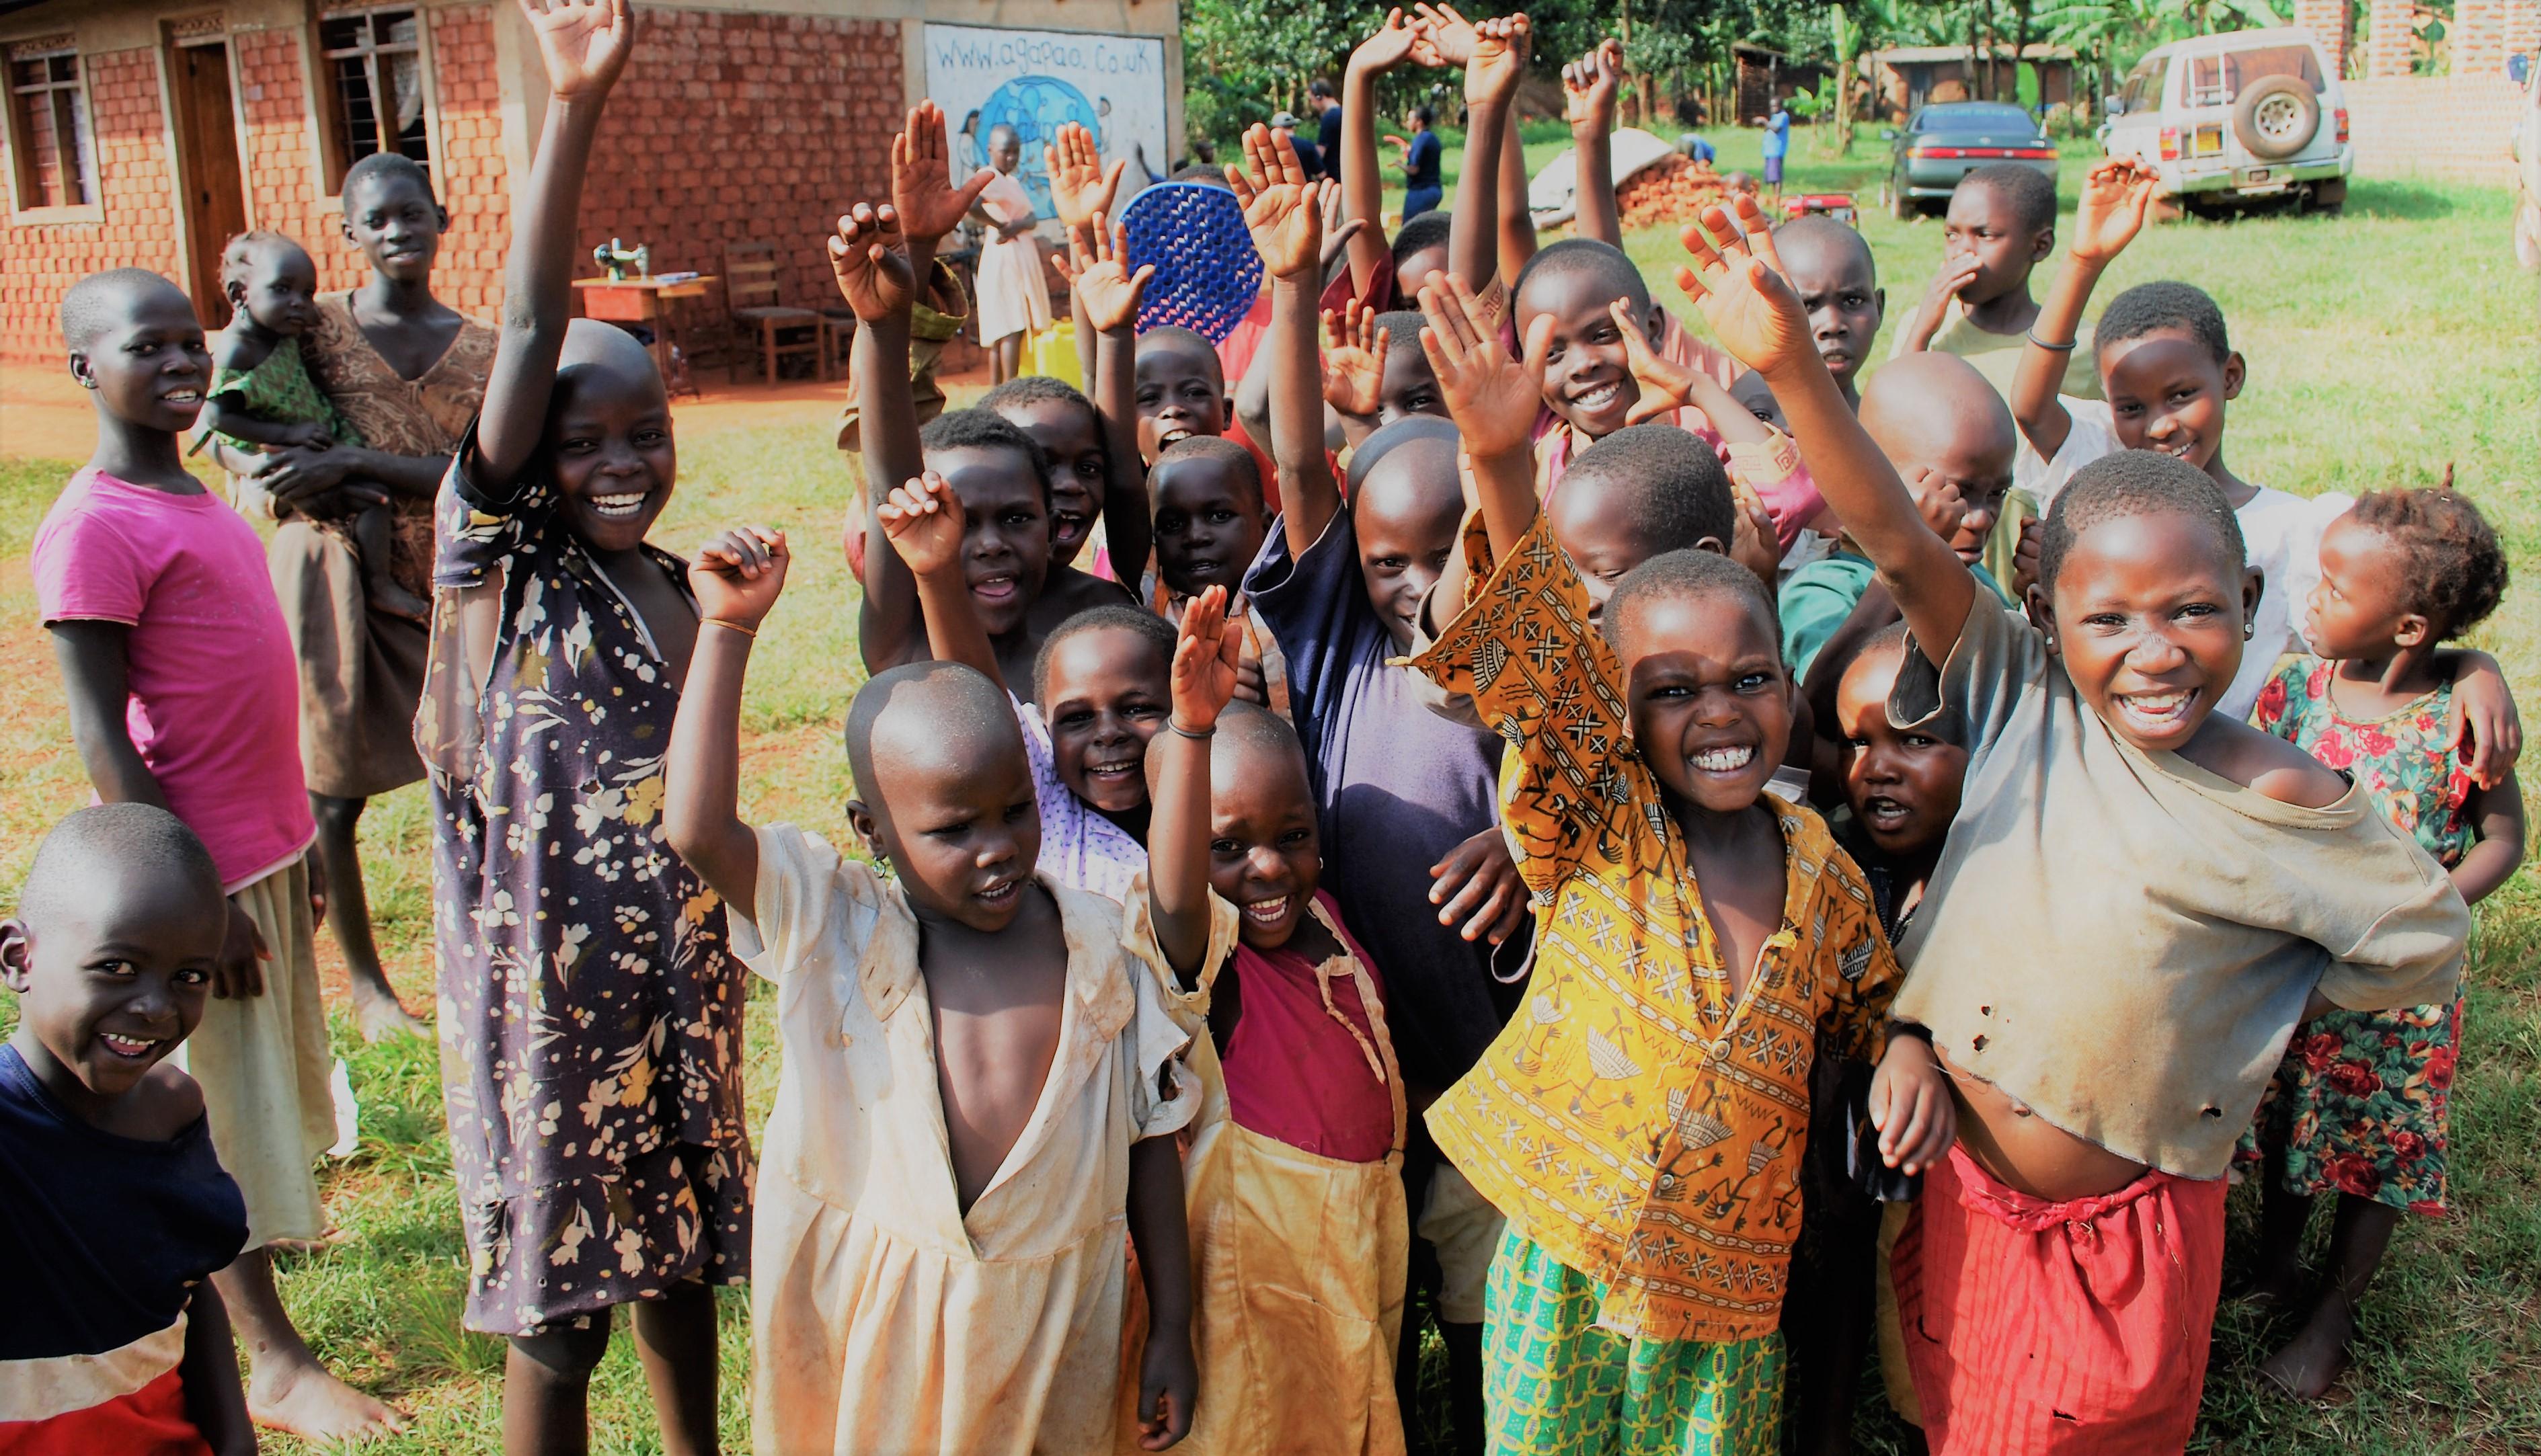 Children chearing